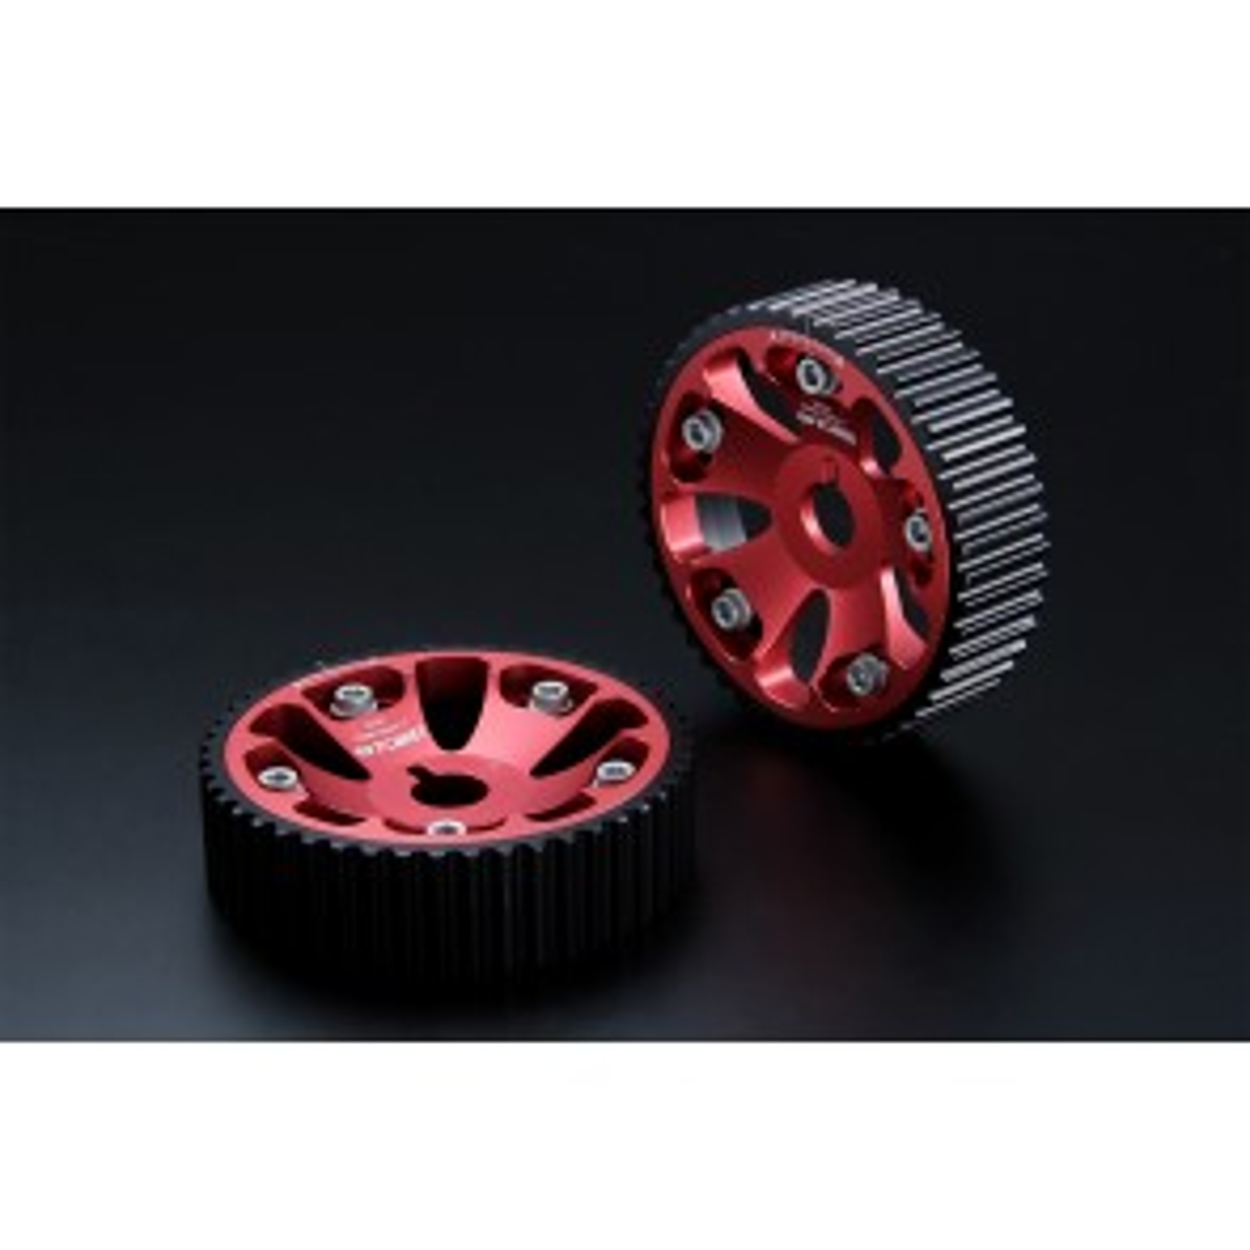 Tomei 1JZ 2JZ Exhaust Adjustable Cam Gear For Toyota Chaser Mark II Cresta JZX100 Supra JZA70 JZA80